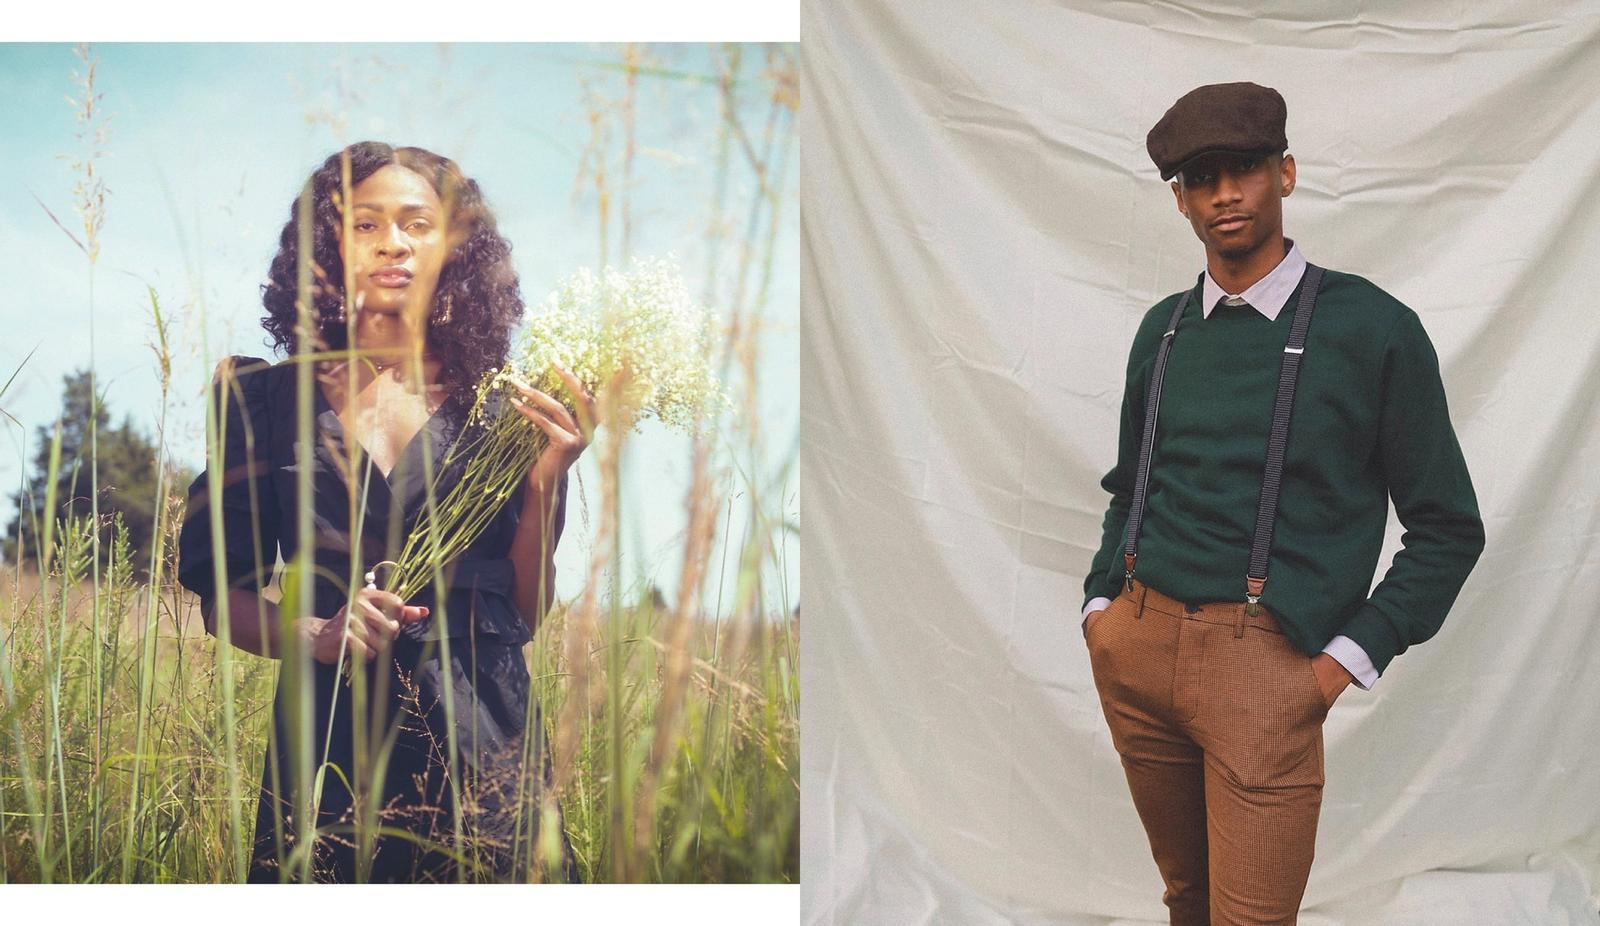 Stylist: Anita Johnson, Photographer: Mikayla Kween and Torrance H., Models: Amadea Allen and Justin Artis